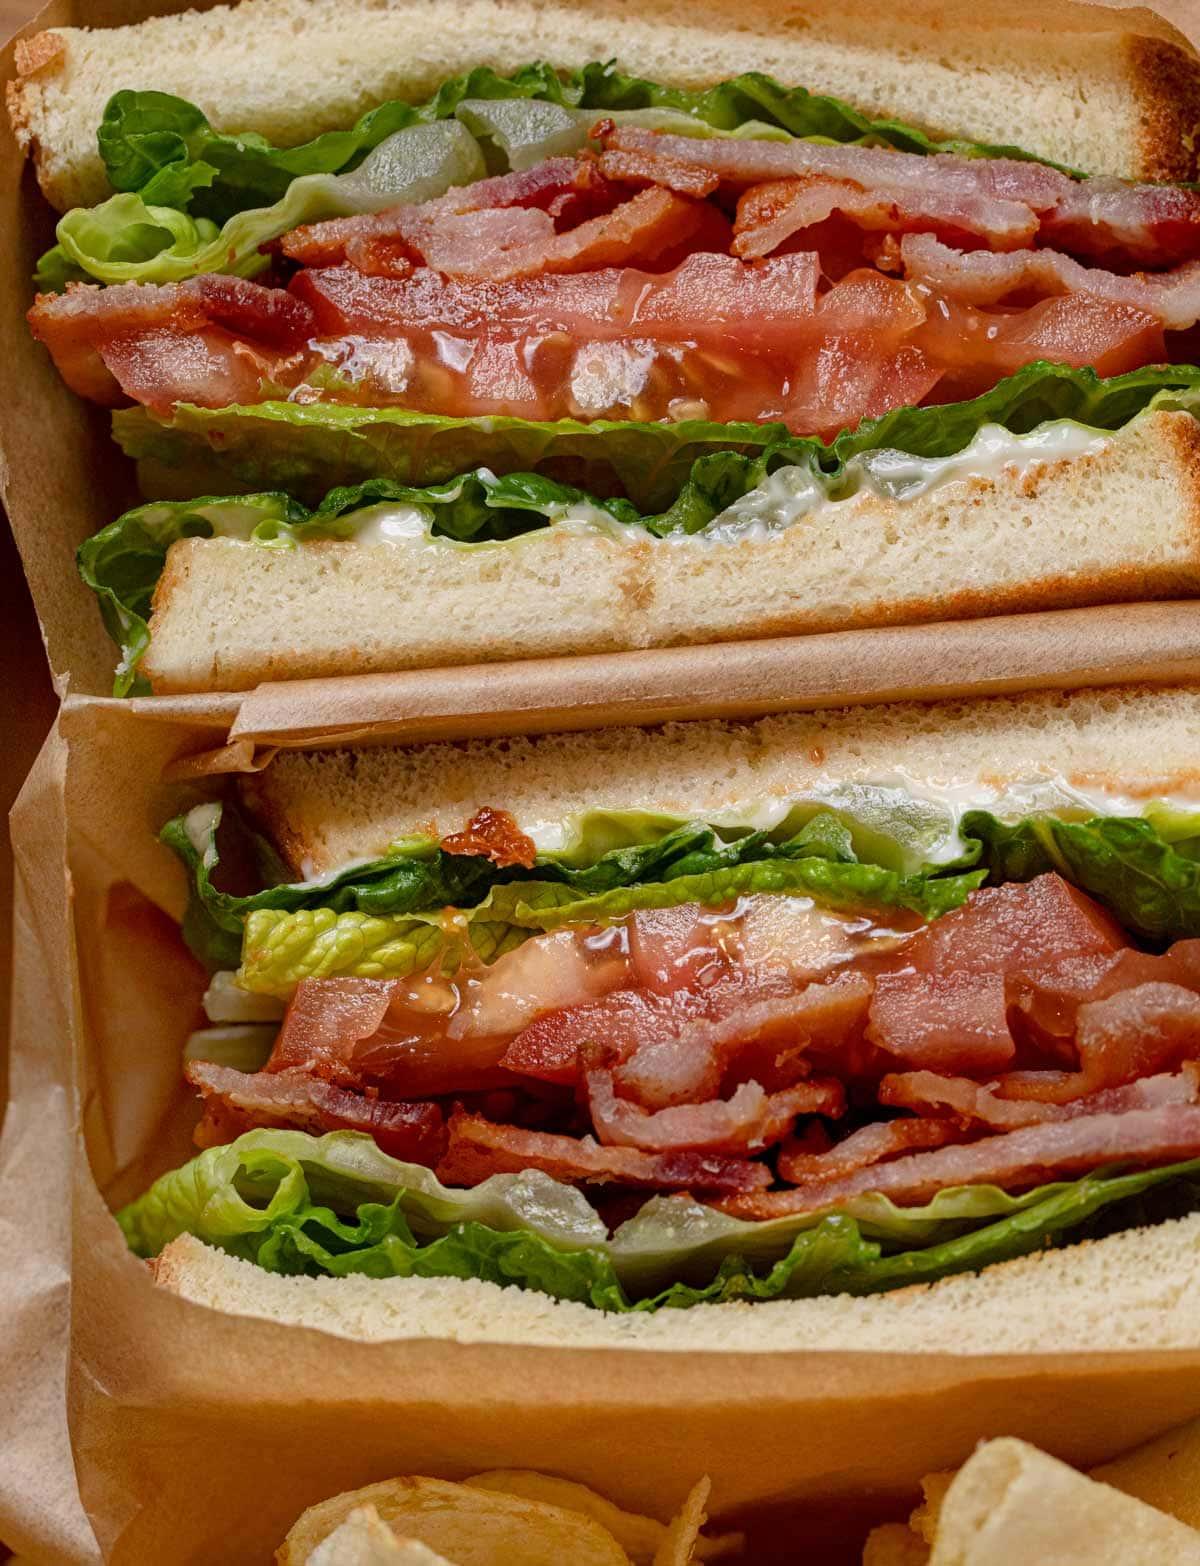 close-up of BLT Sandwich sliced in half